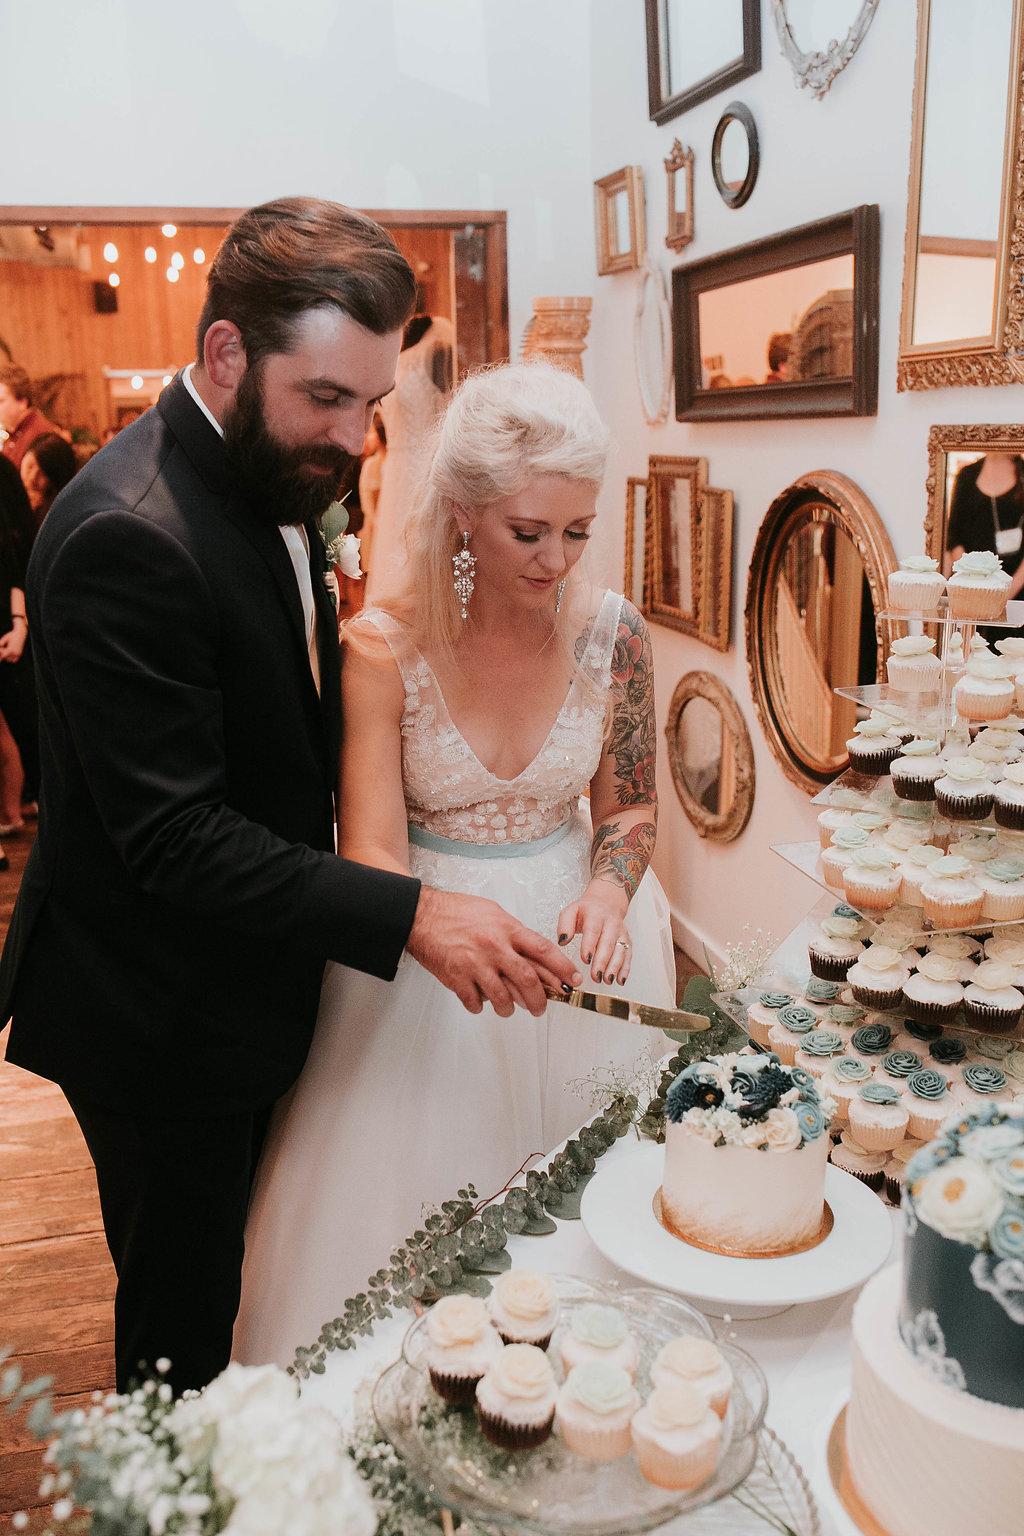 The_Big_Fake_wedding_Seattle_Within_sodo_wedding_by_Adina_Preston_Weddings_497.JPG